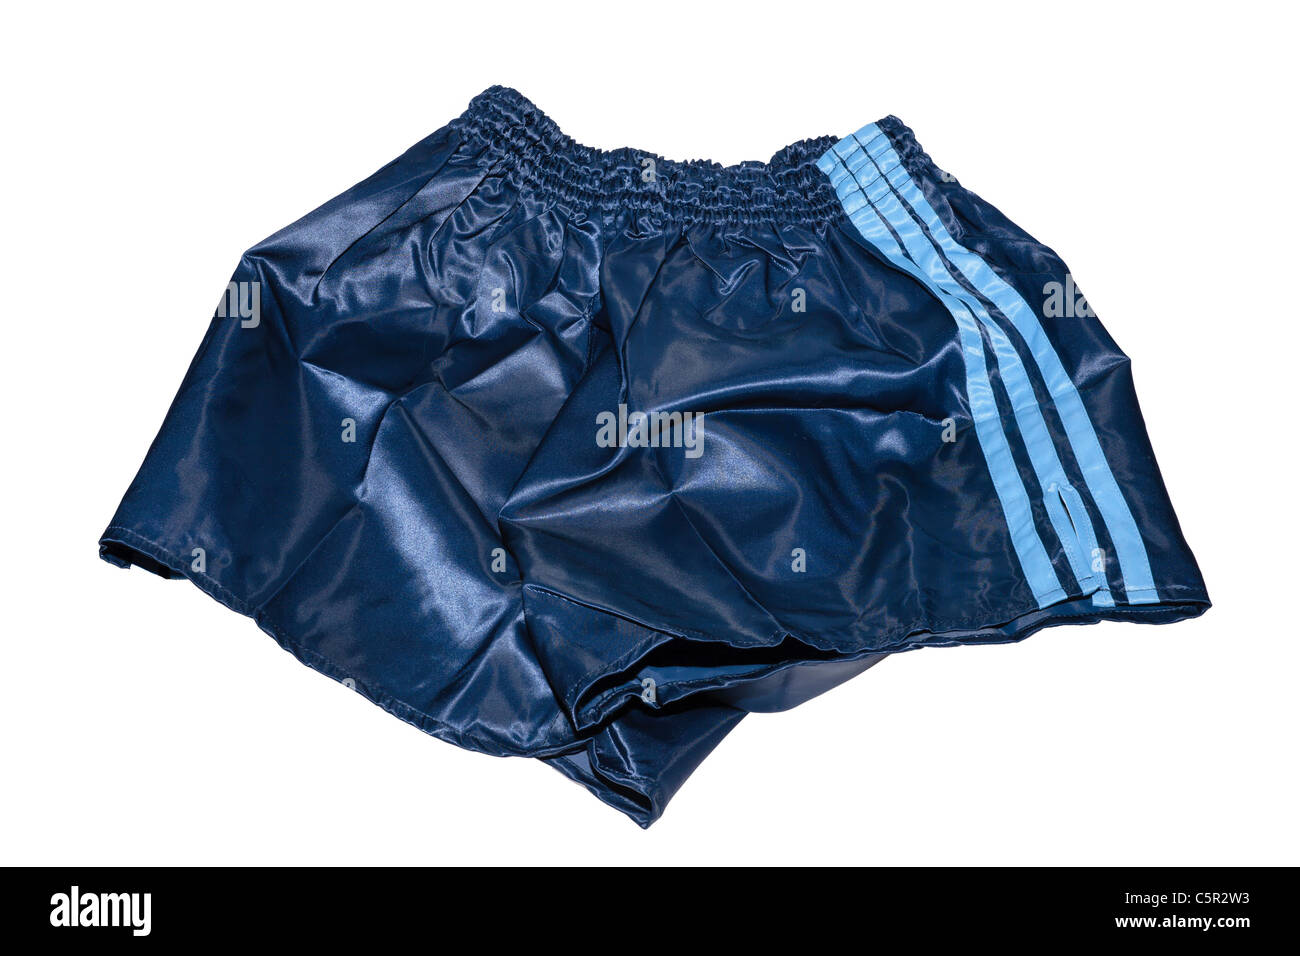 Corbata césped Correspondiente  A pair of Adidas vintage nylon football sportswear shorts Stock Photo -  Alamy